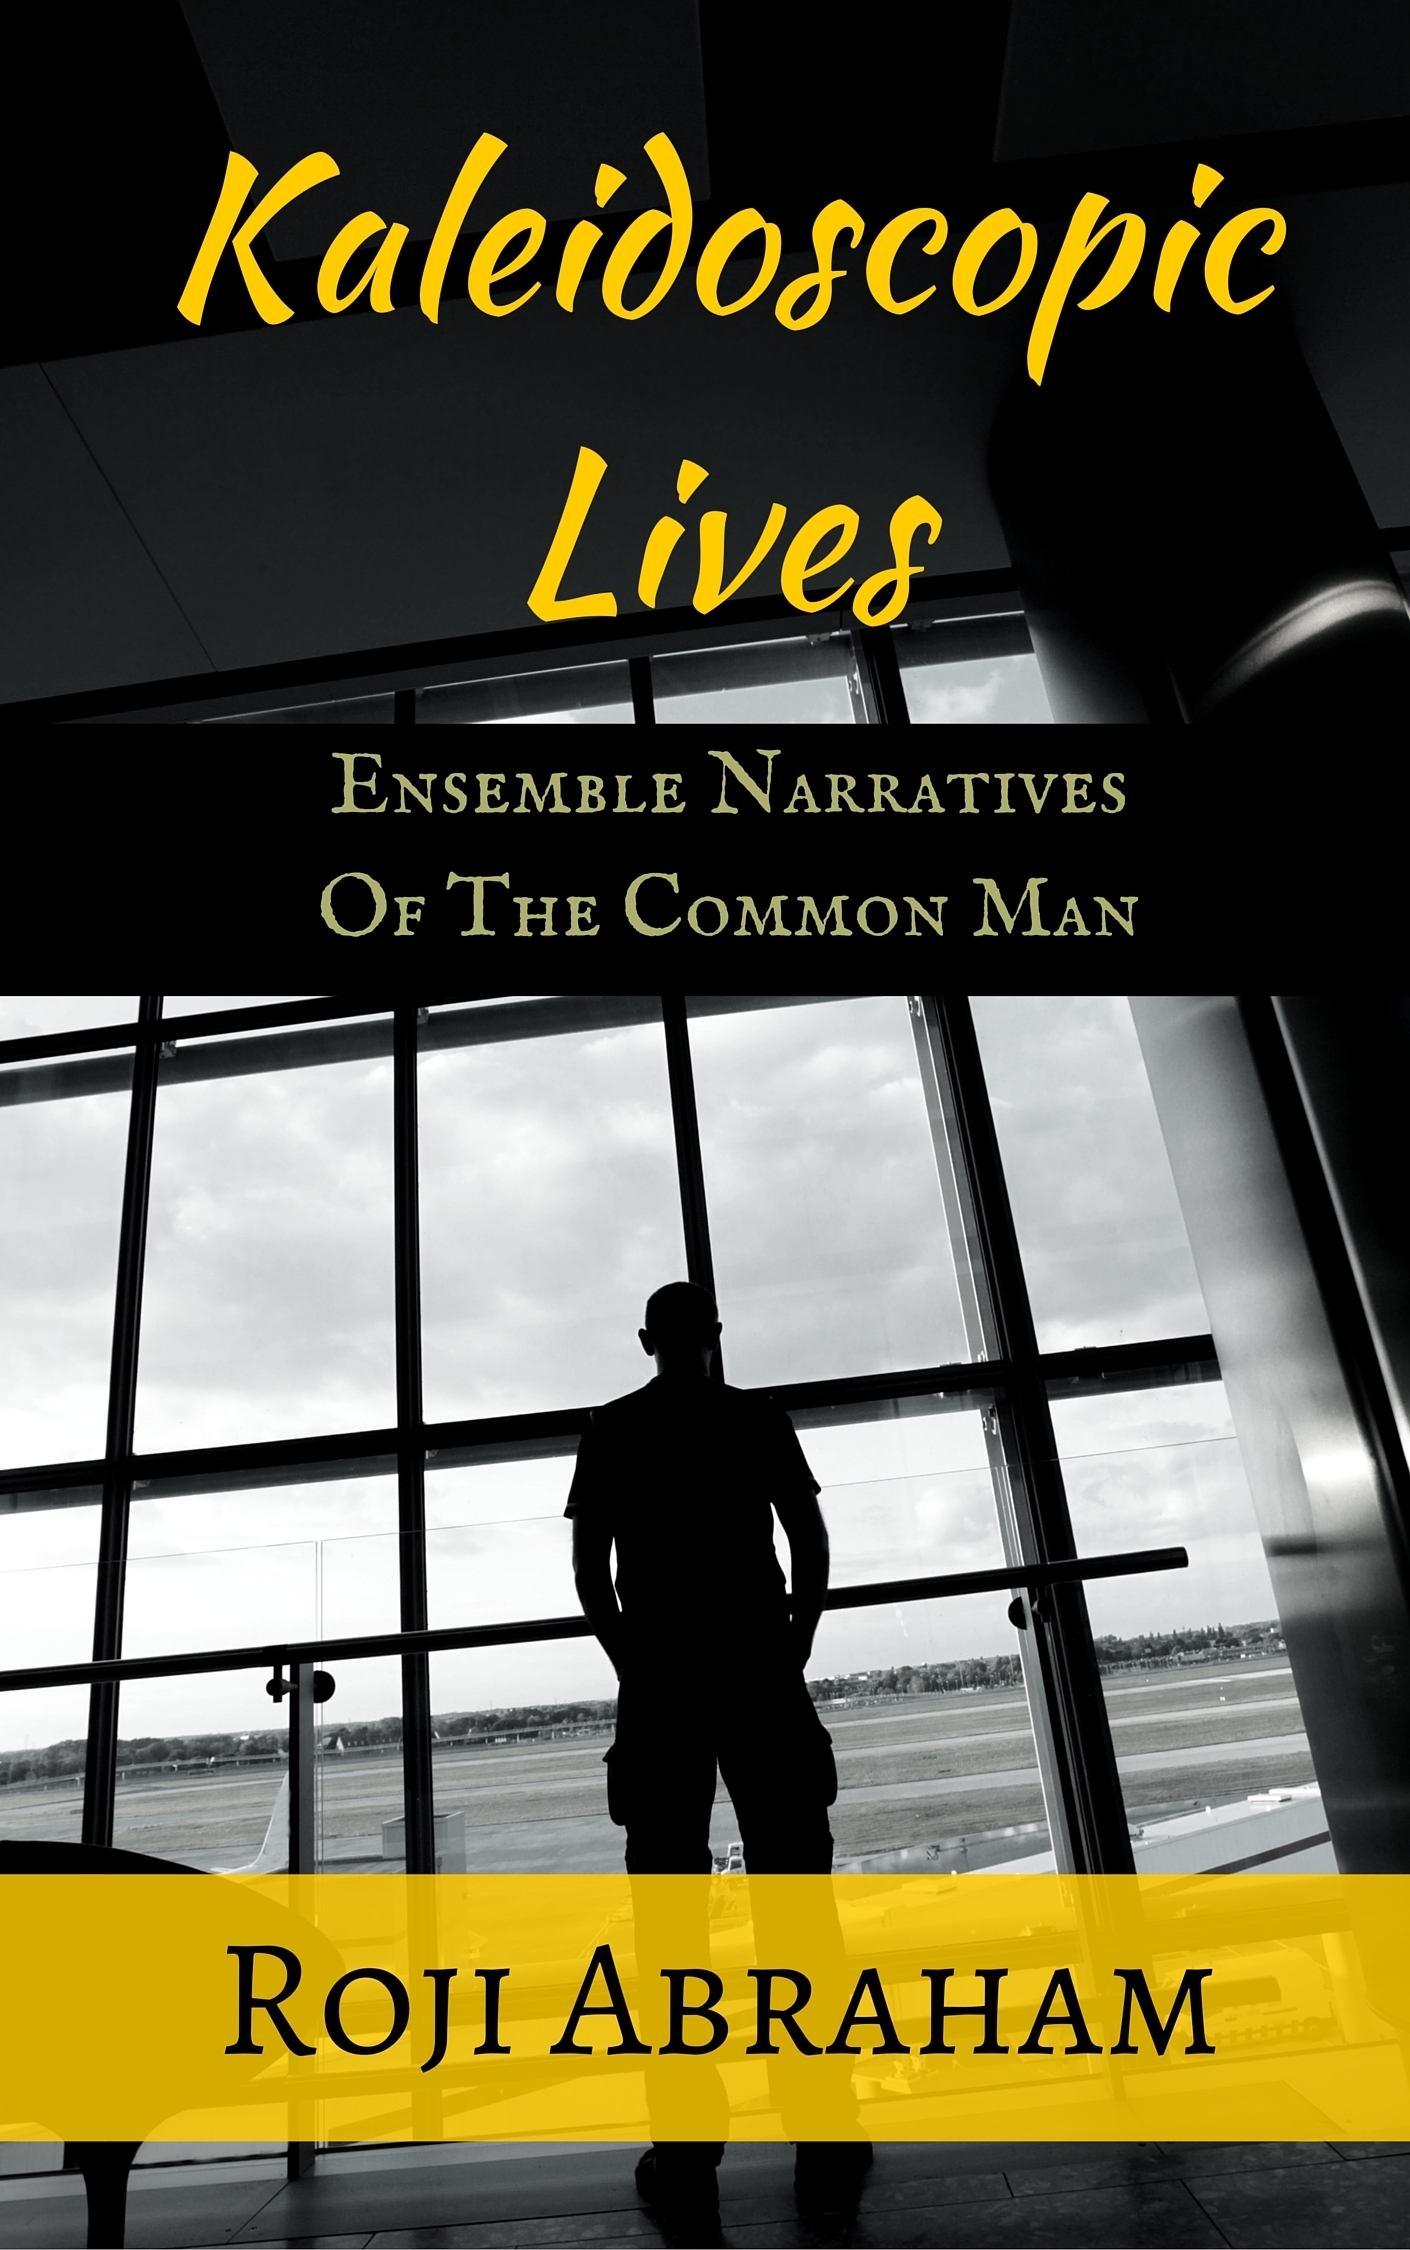 Kaleidoscopic Lives: Ensemble Narratives Of The Common Man  by  Roji Abraham